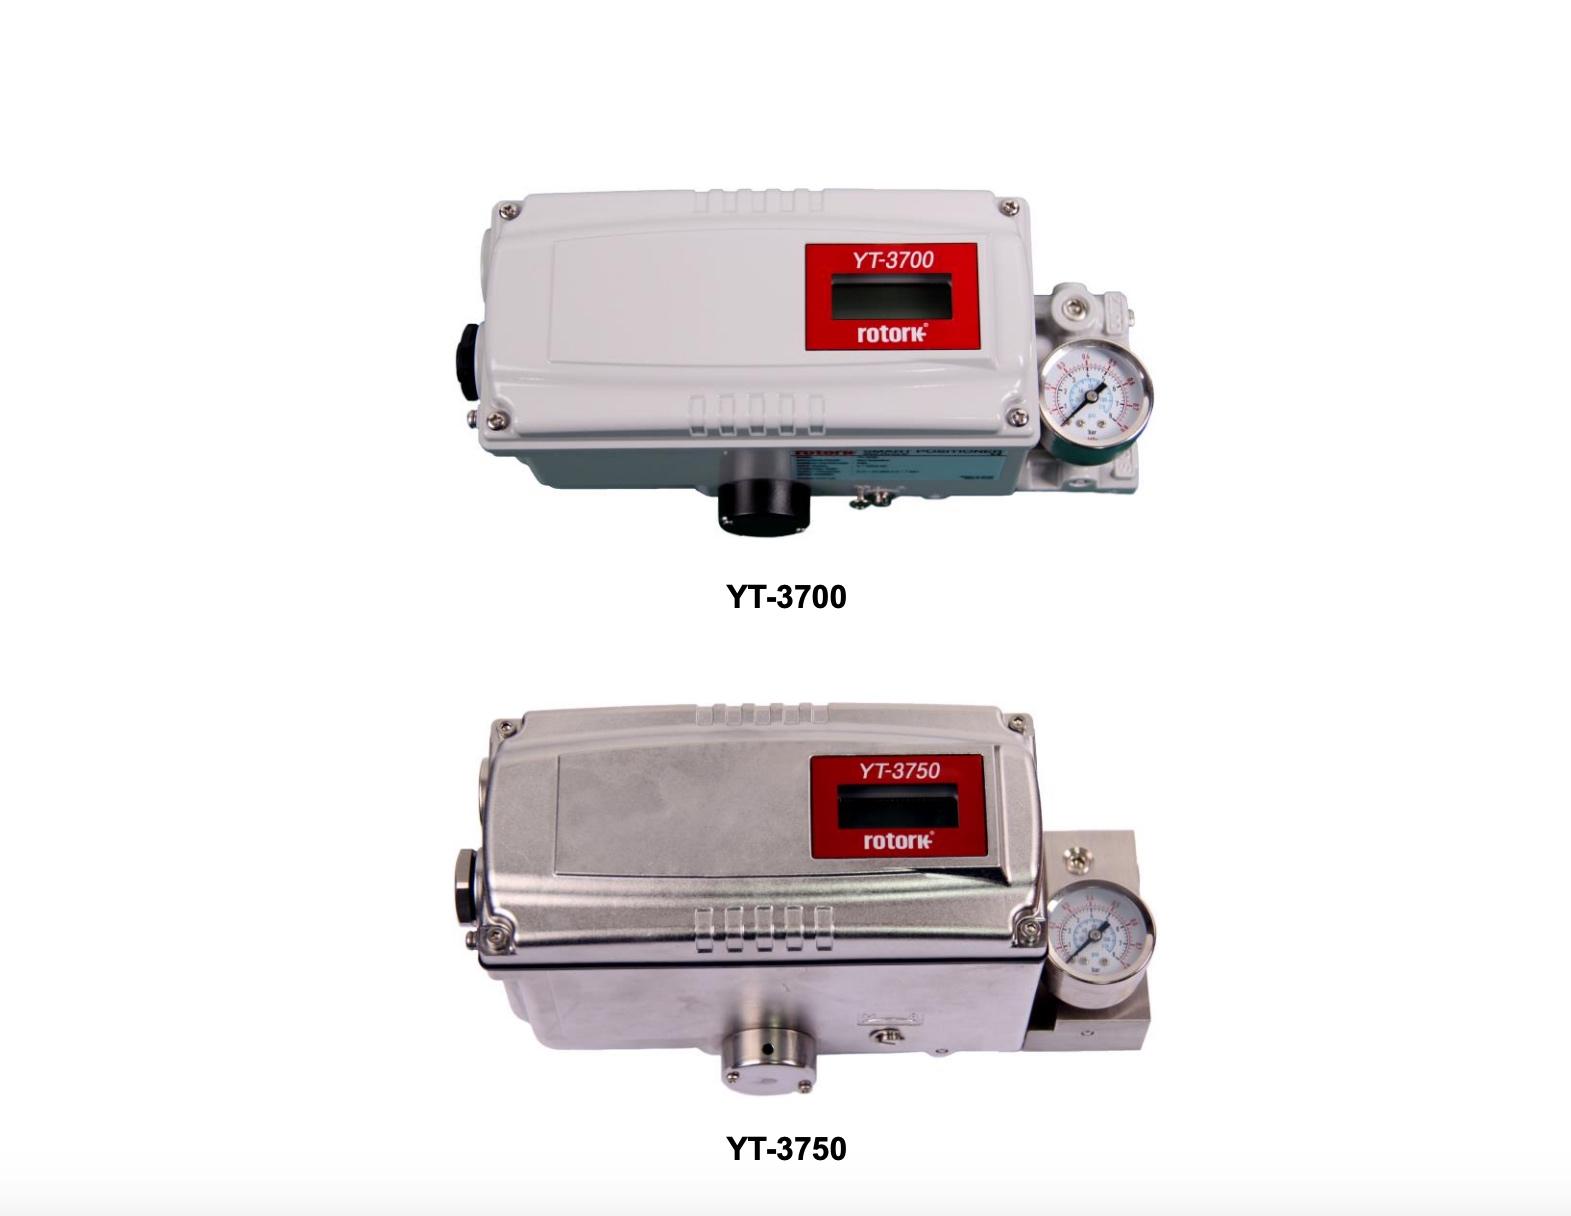 rotork new smart valves